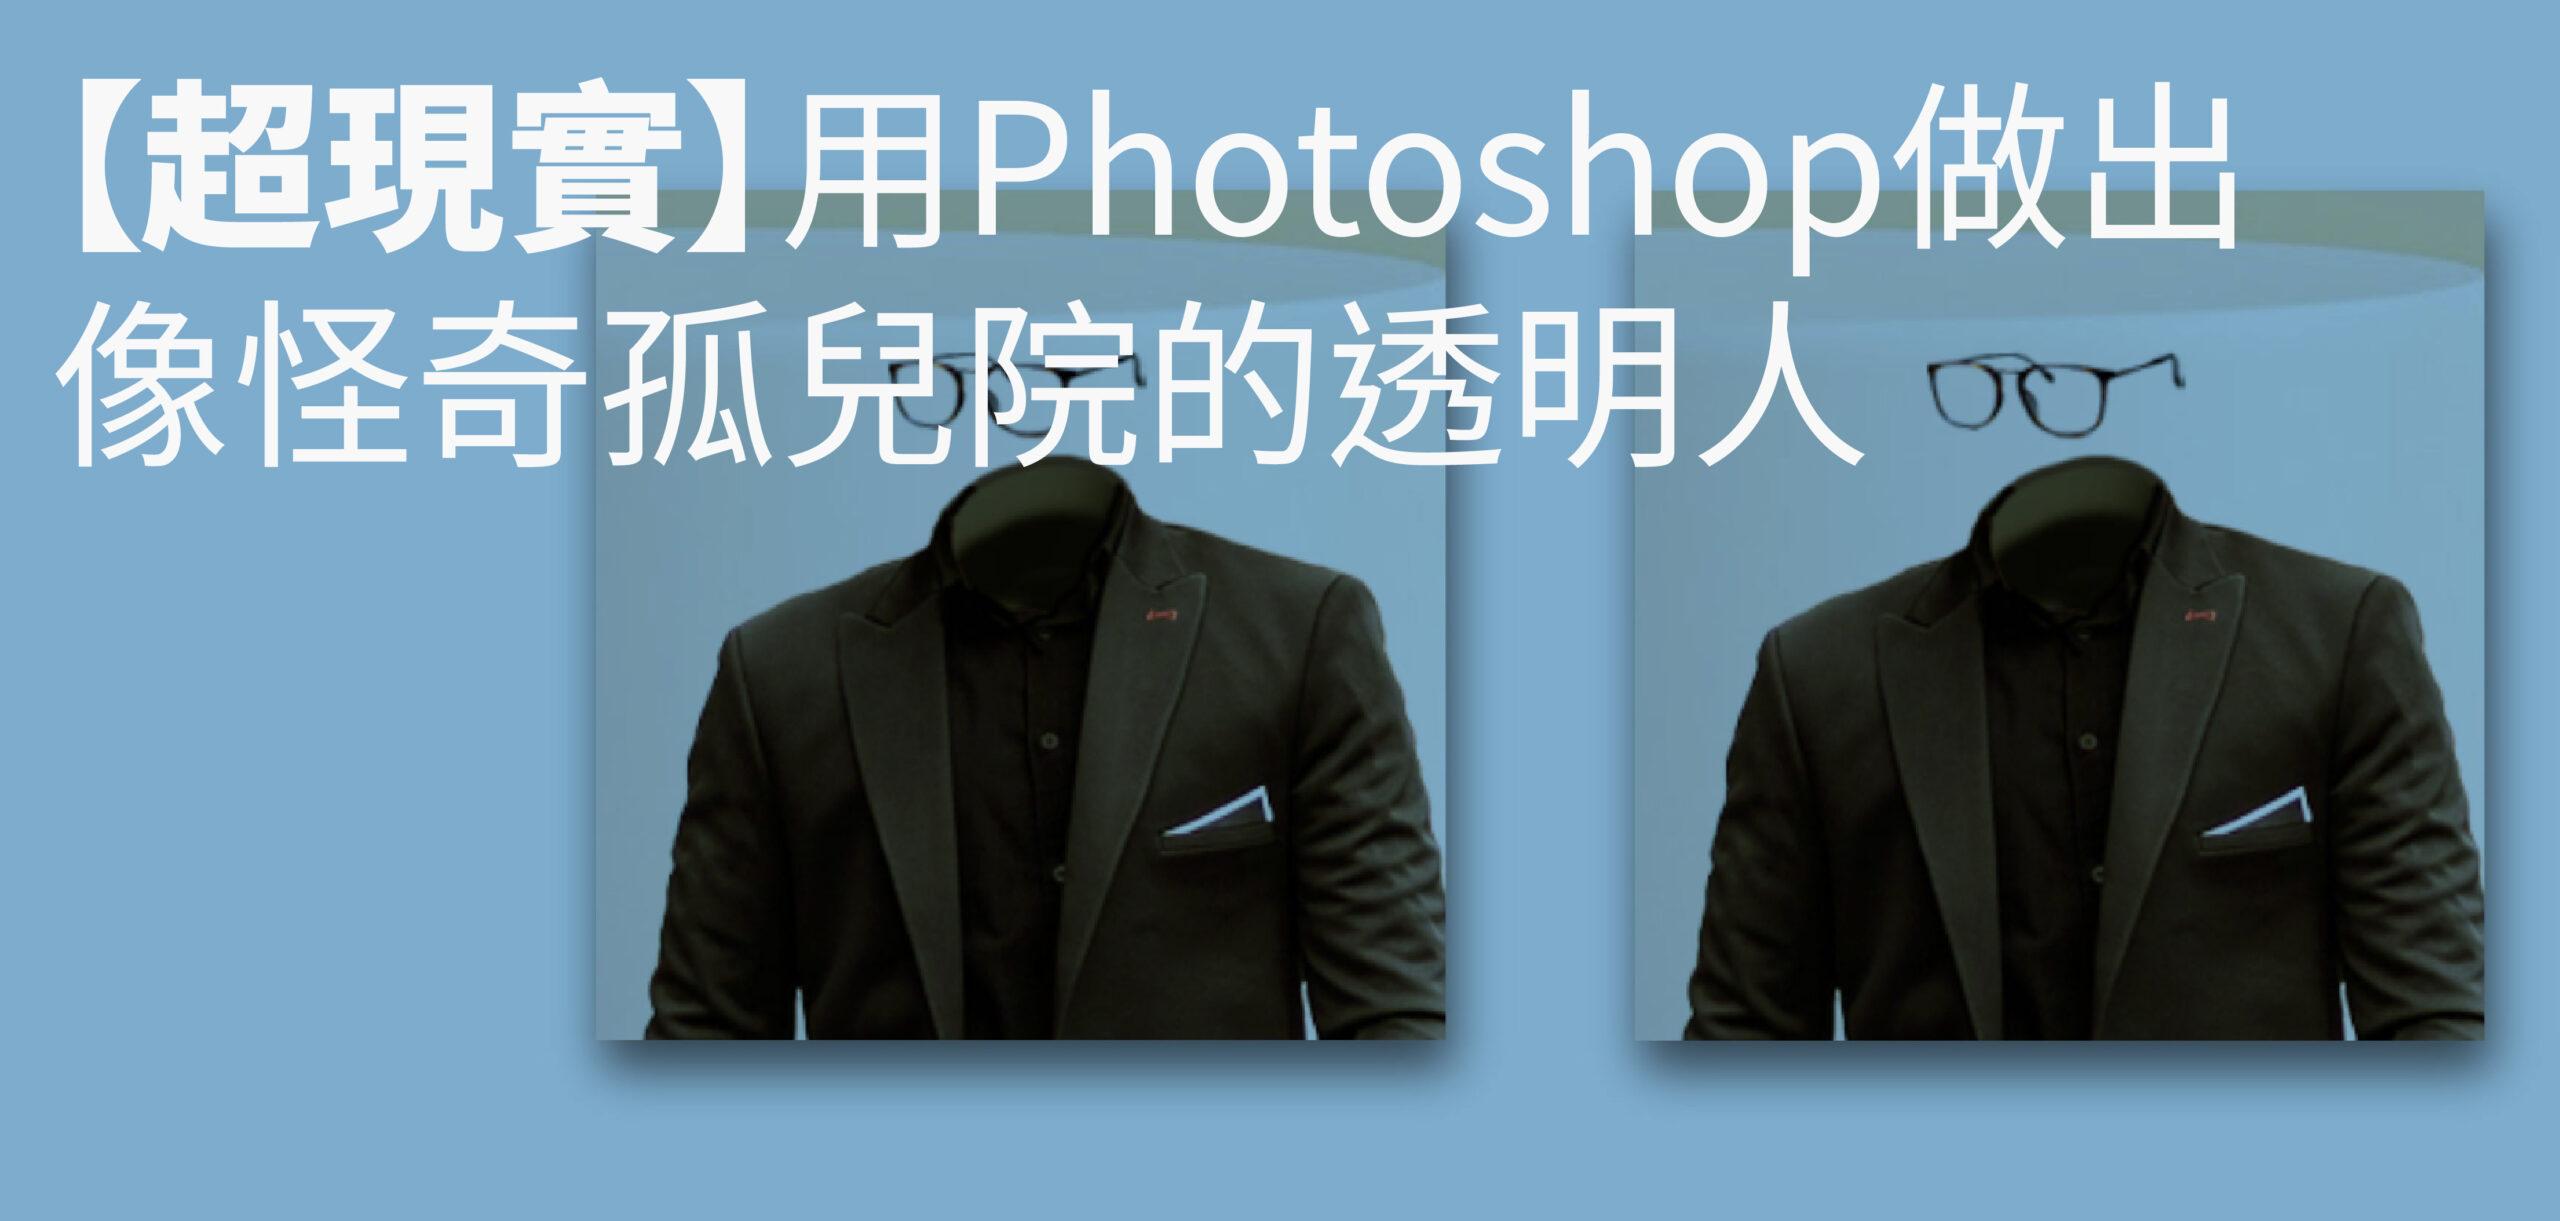 Photoshop 透明